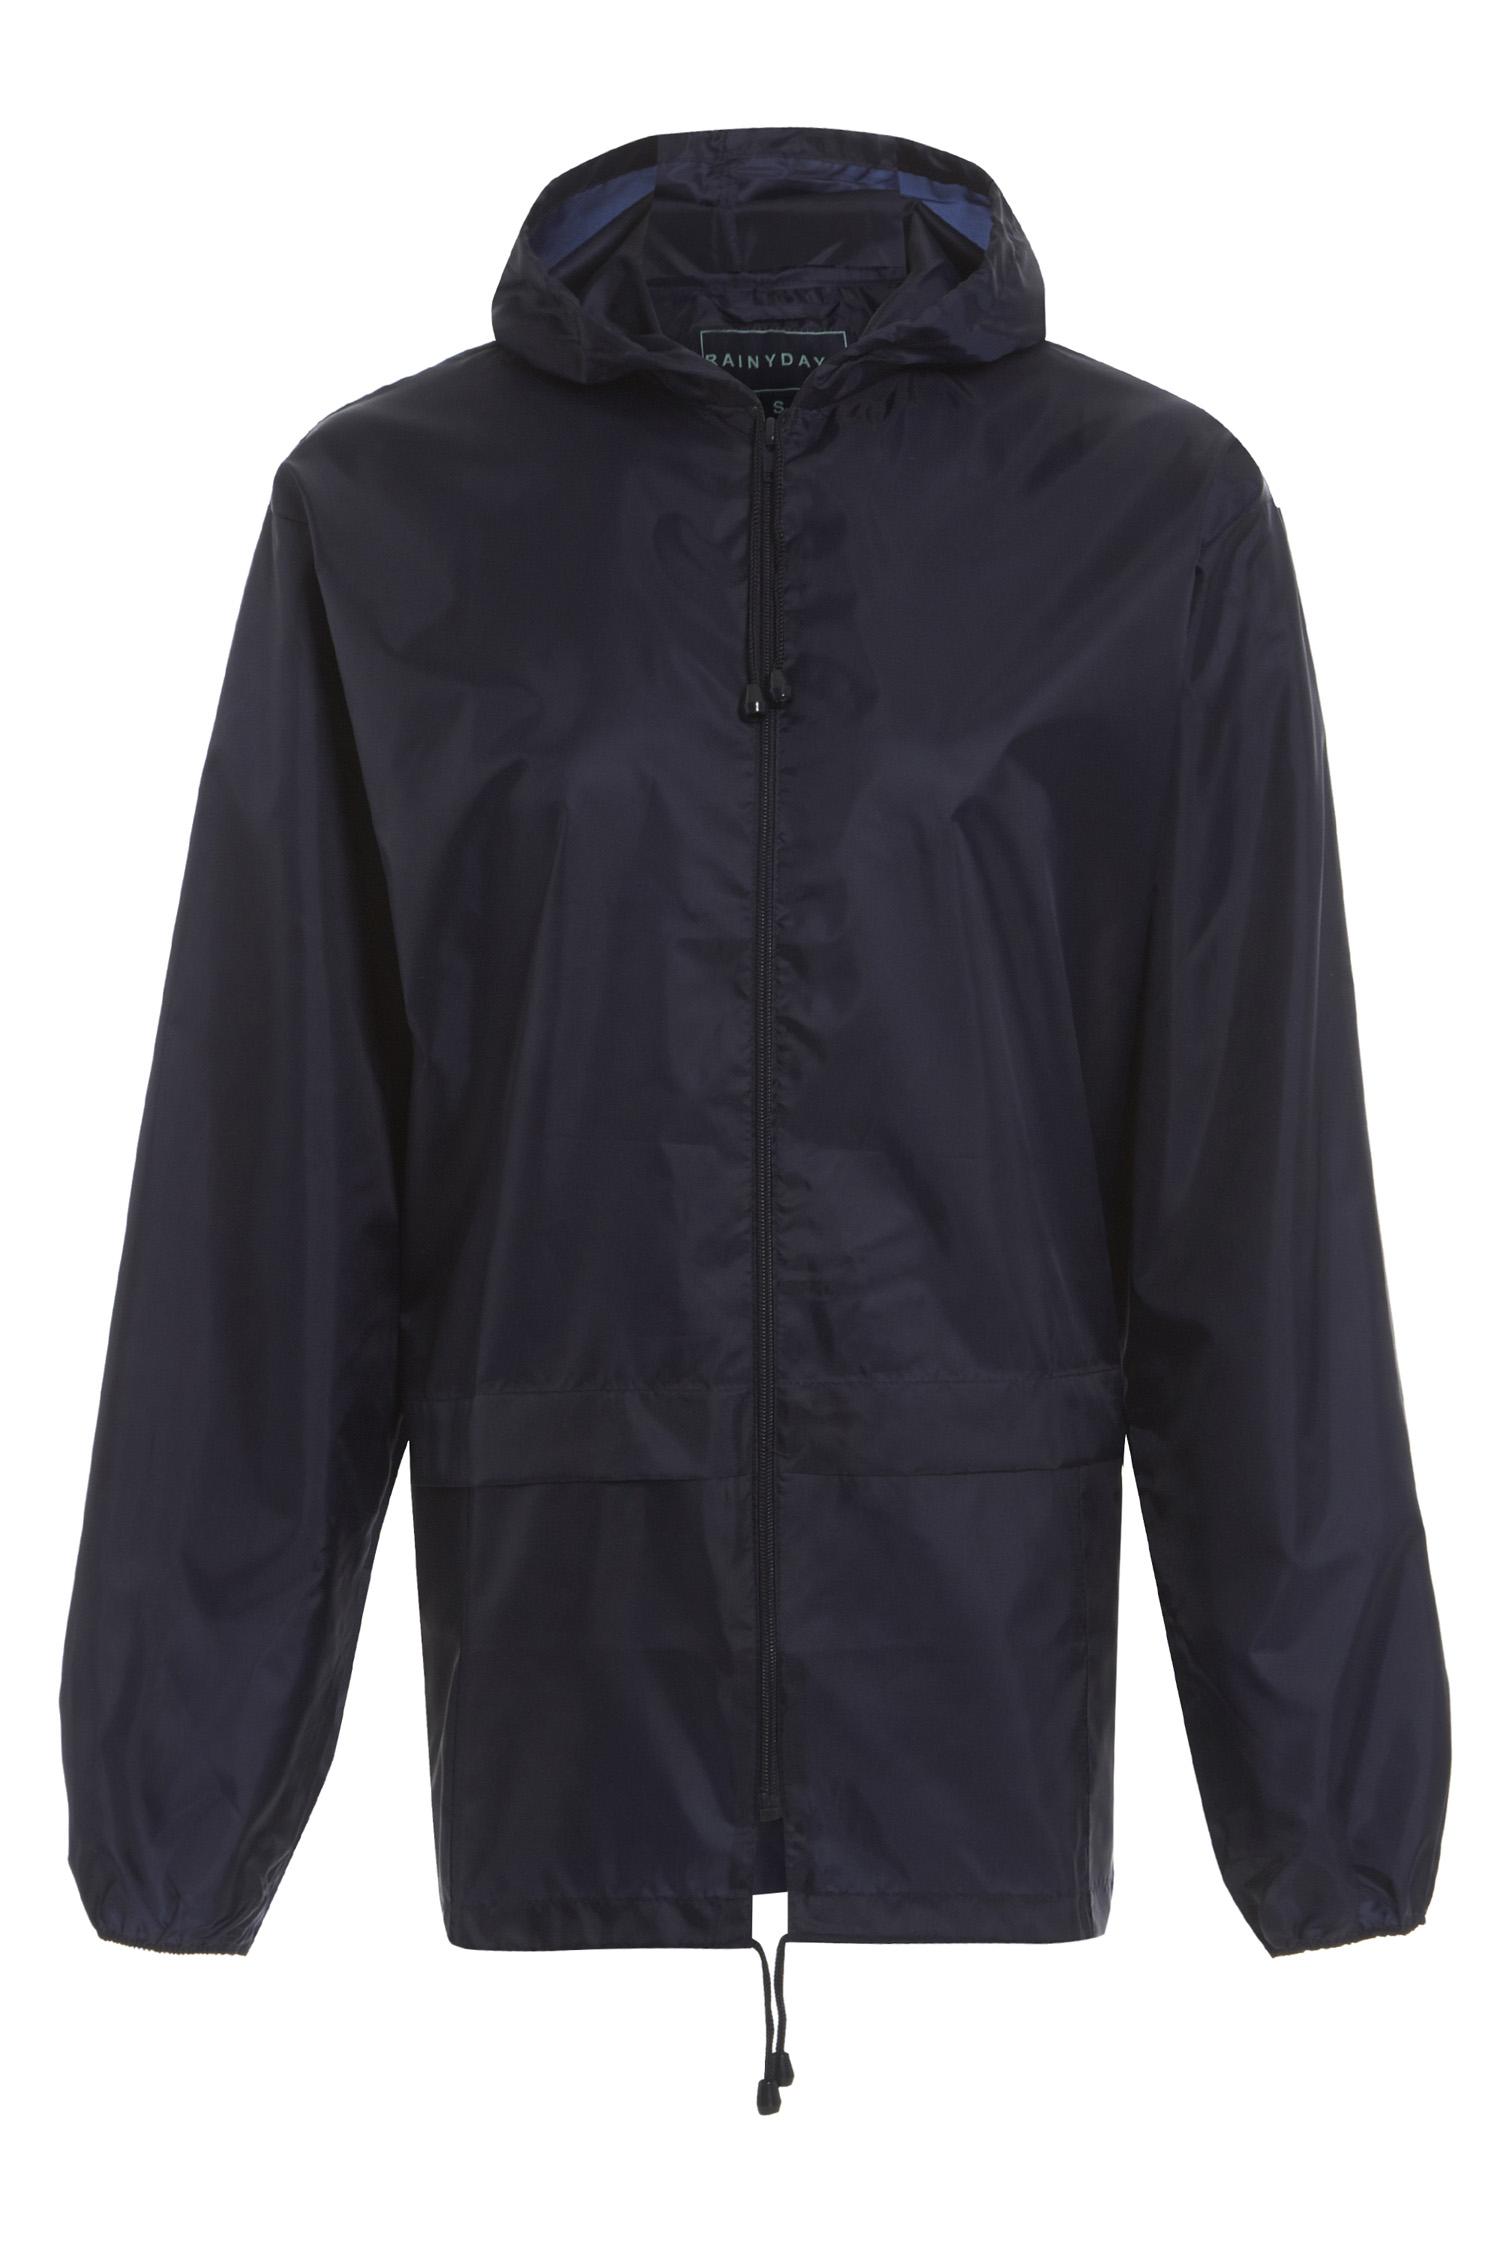 i-Smalls Women/'s Lightweight Summer Waterproof Hooded Rain Jacket Coat Kagool